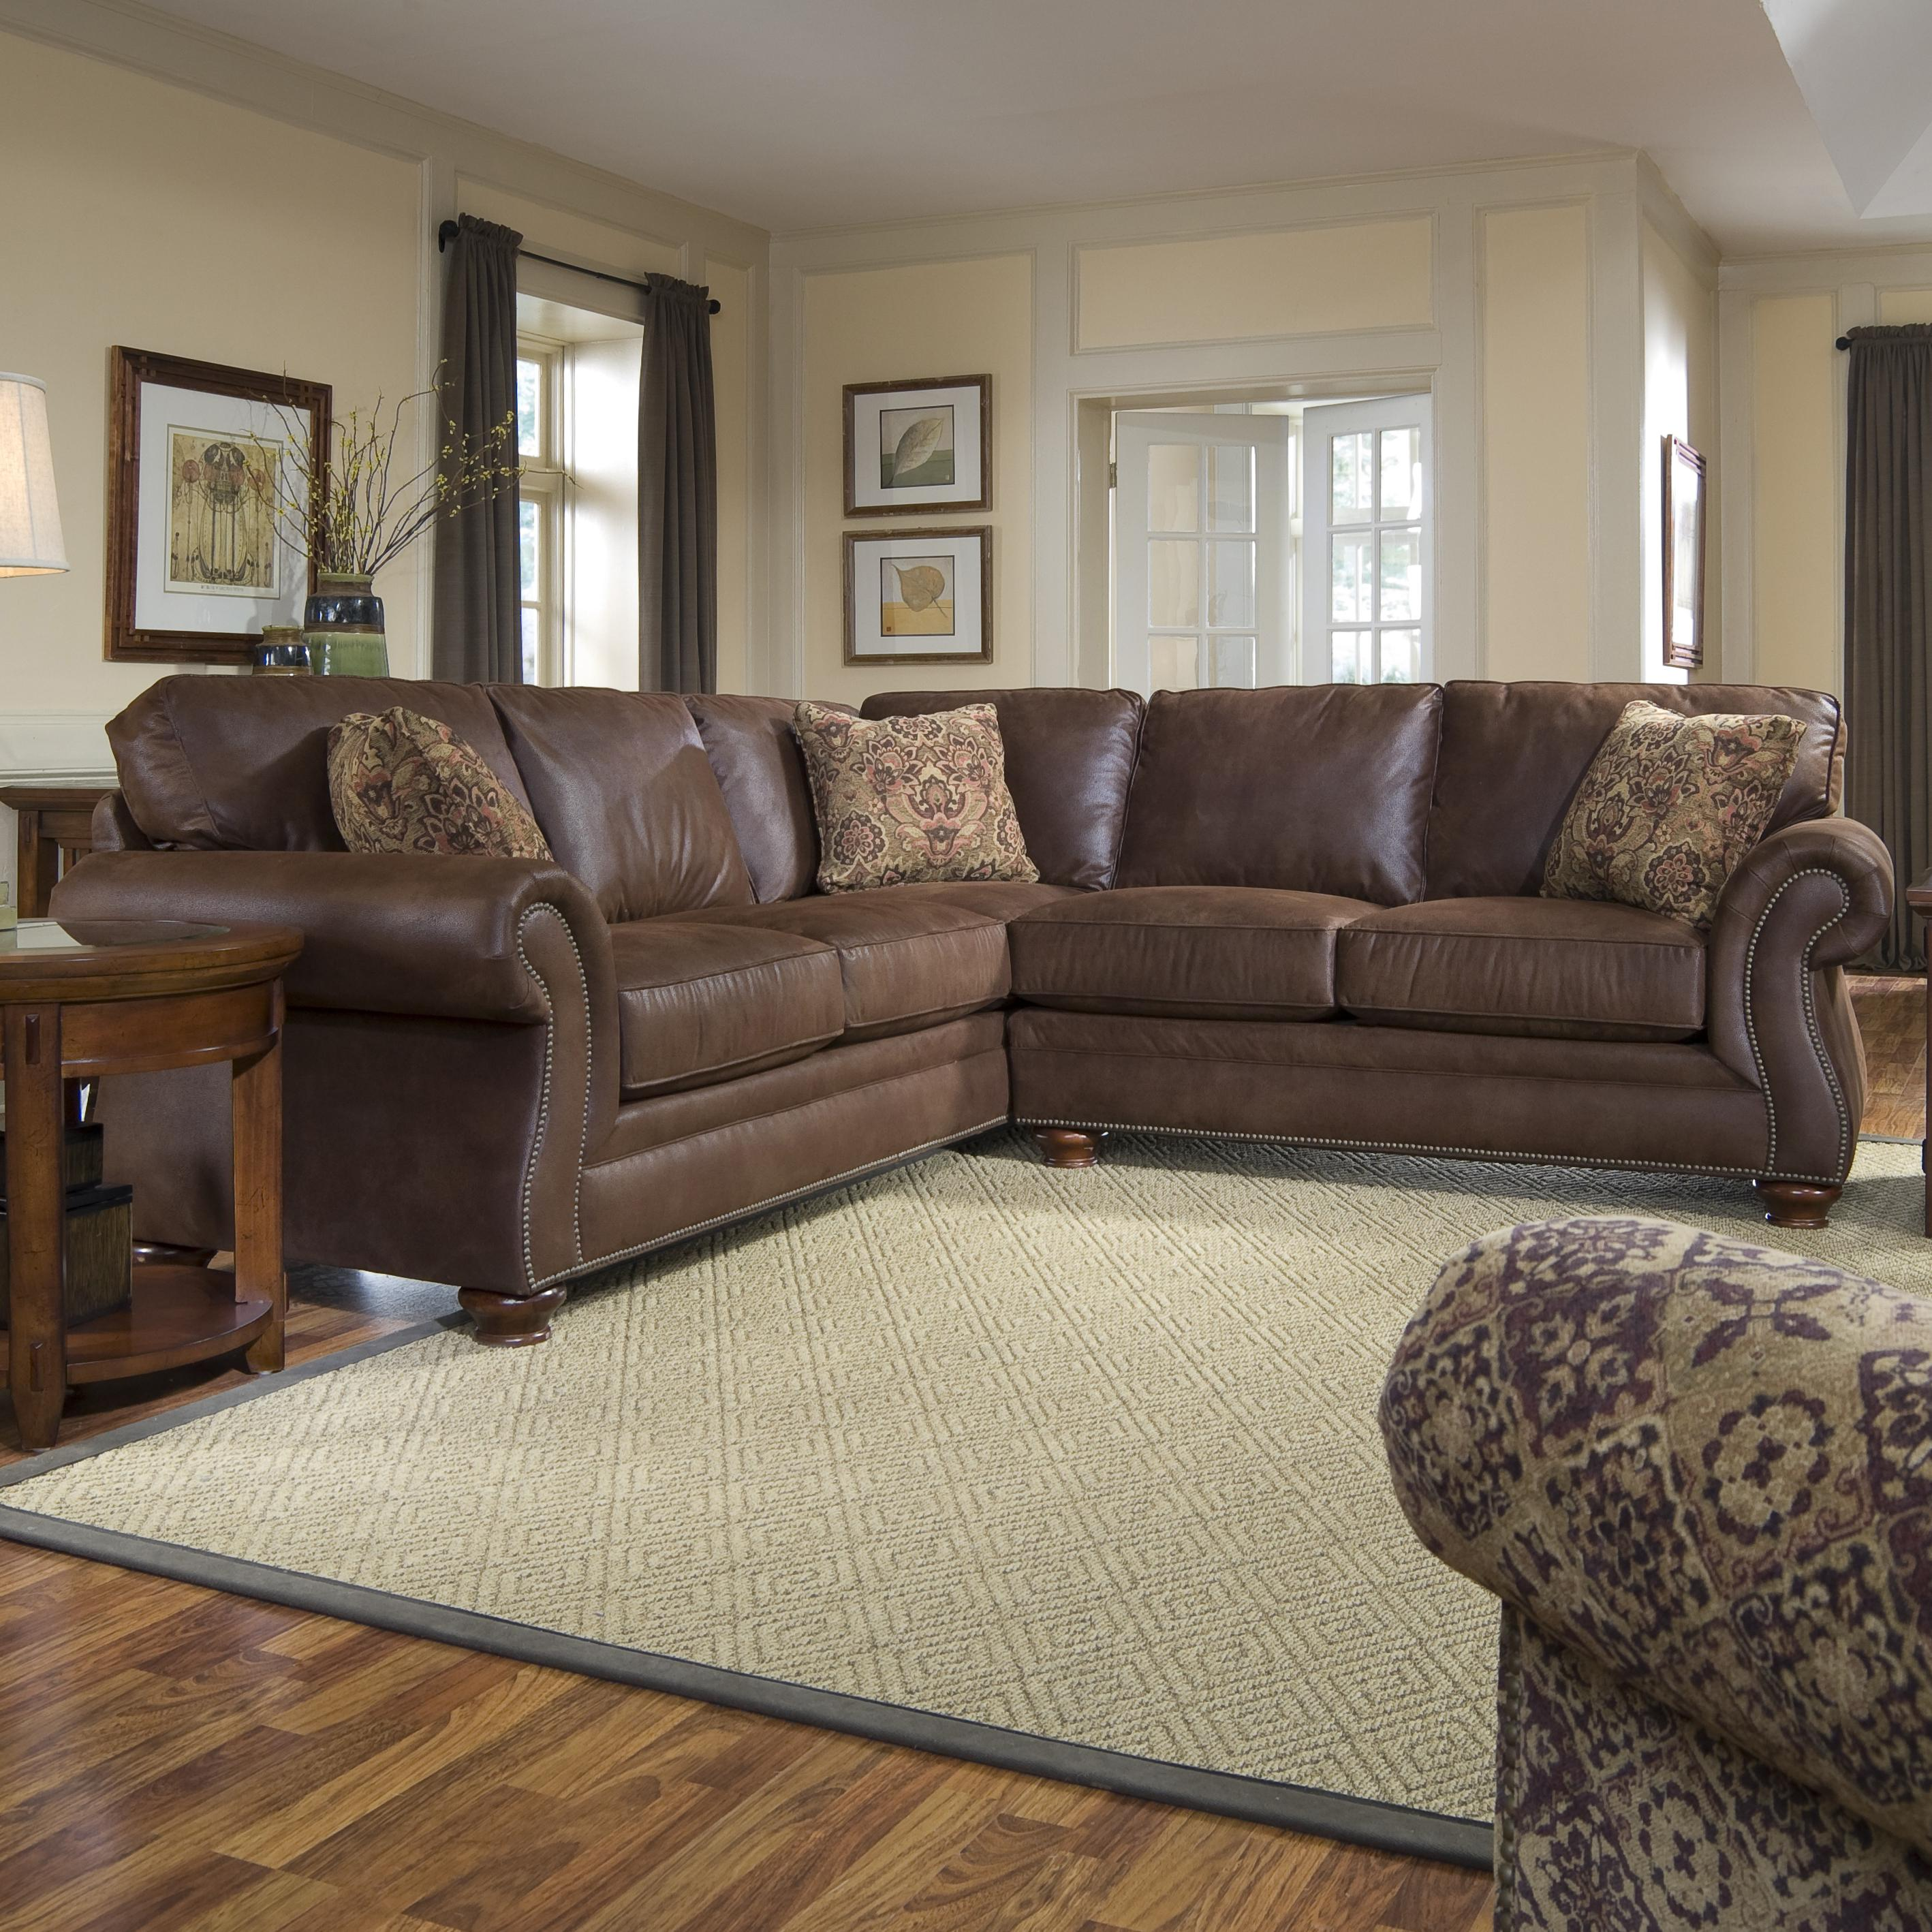 laramie sofa reviews conditioner for leather broyhill sleeper energywarden